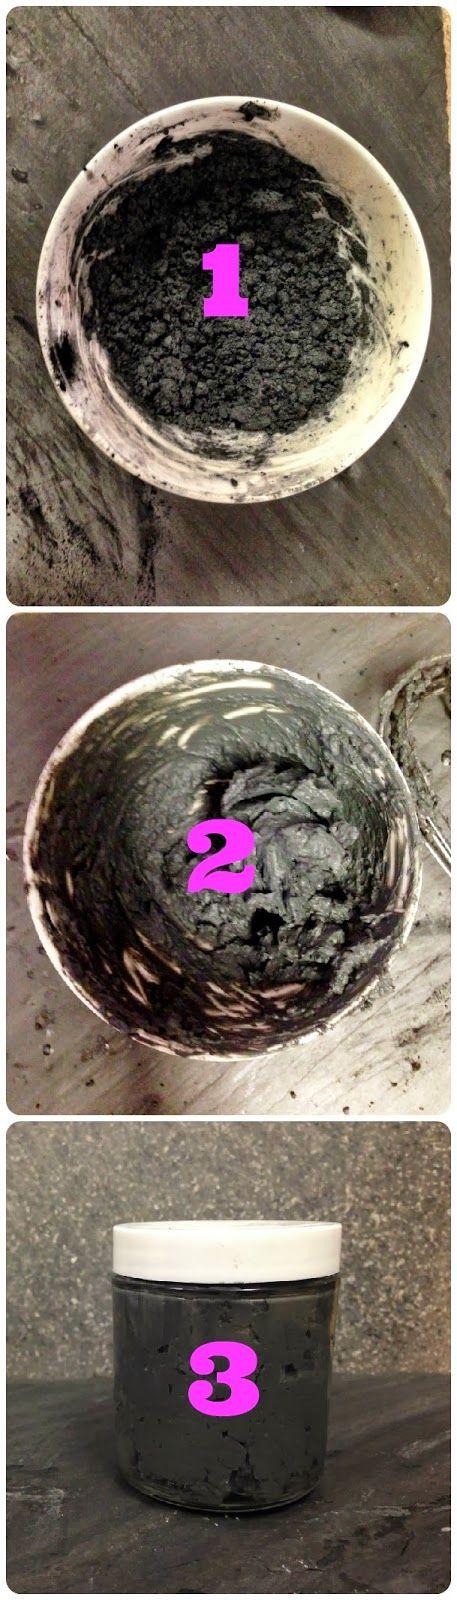 Recipe for Sephora's Glam Glow mud mask. Freaking yes